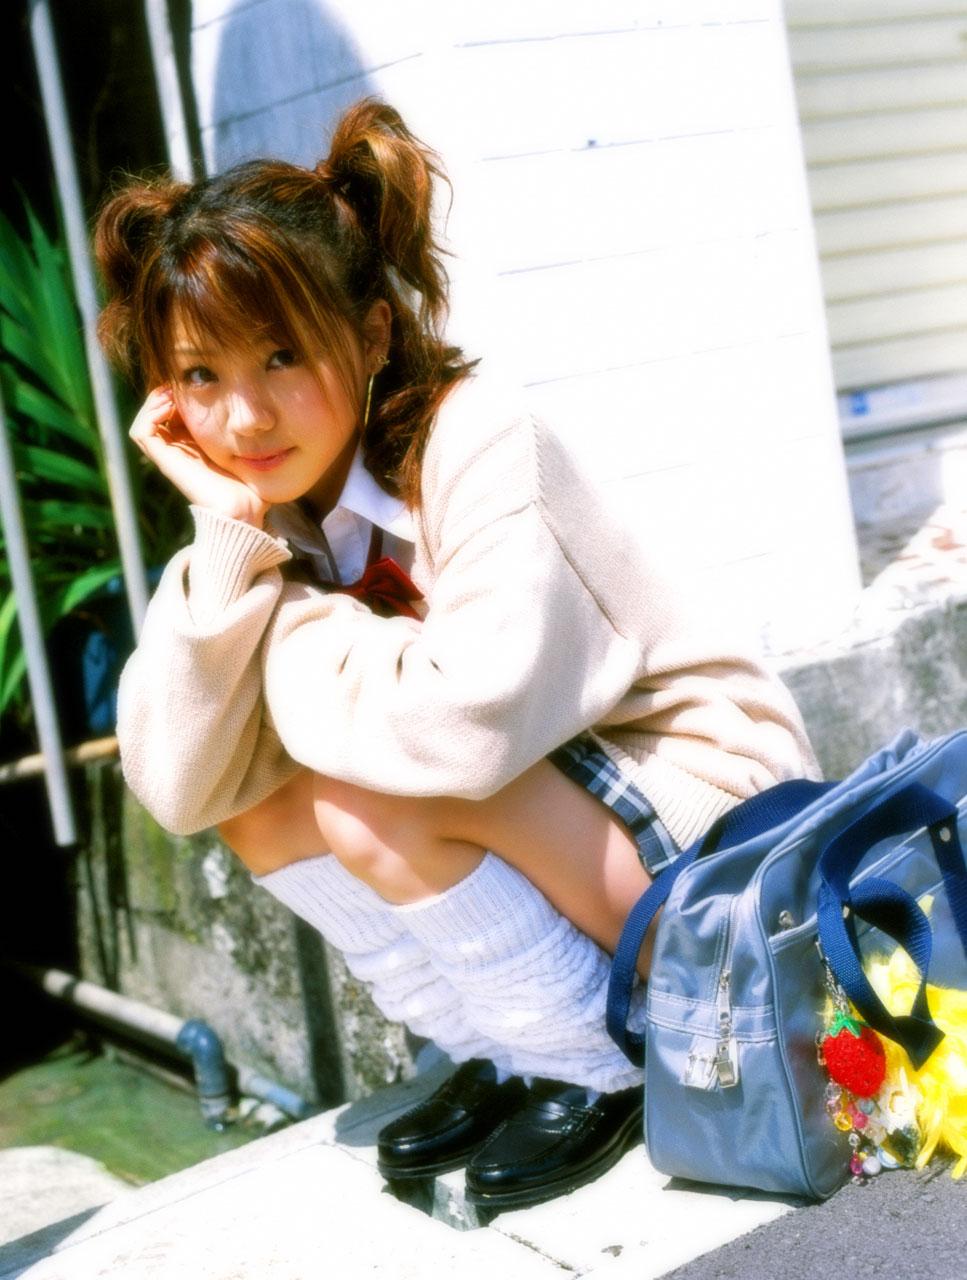 miyama enseki Reina's graduation countdown